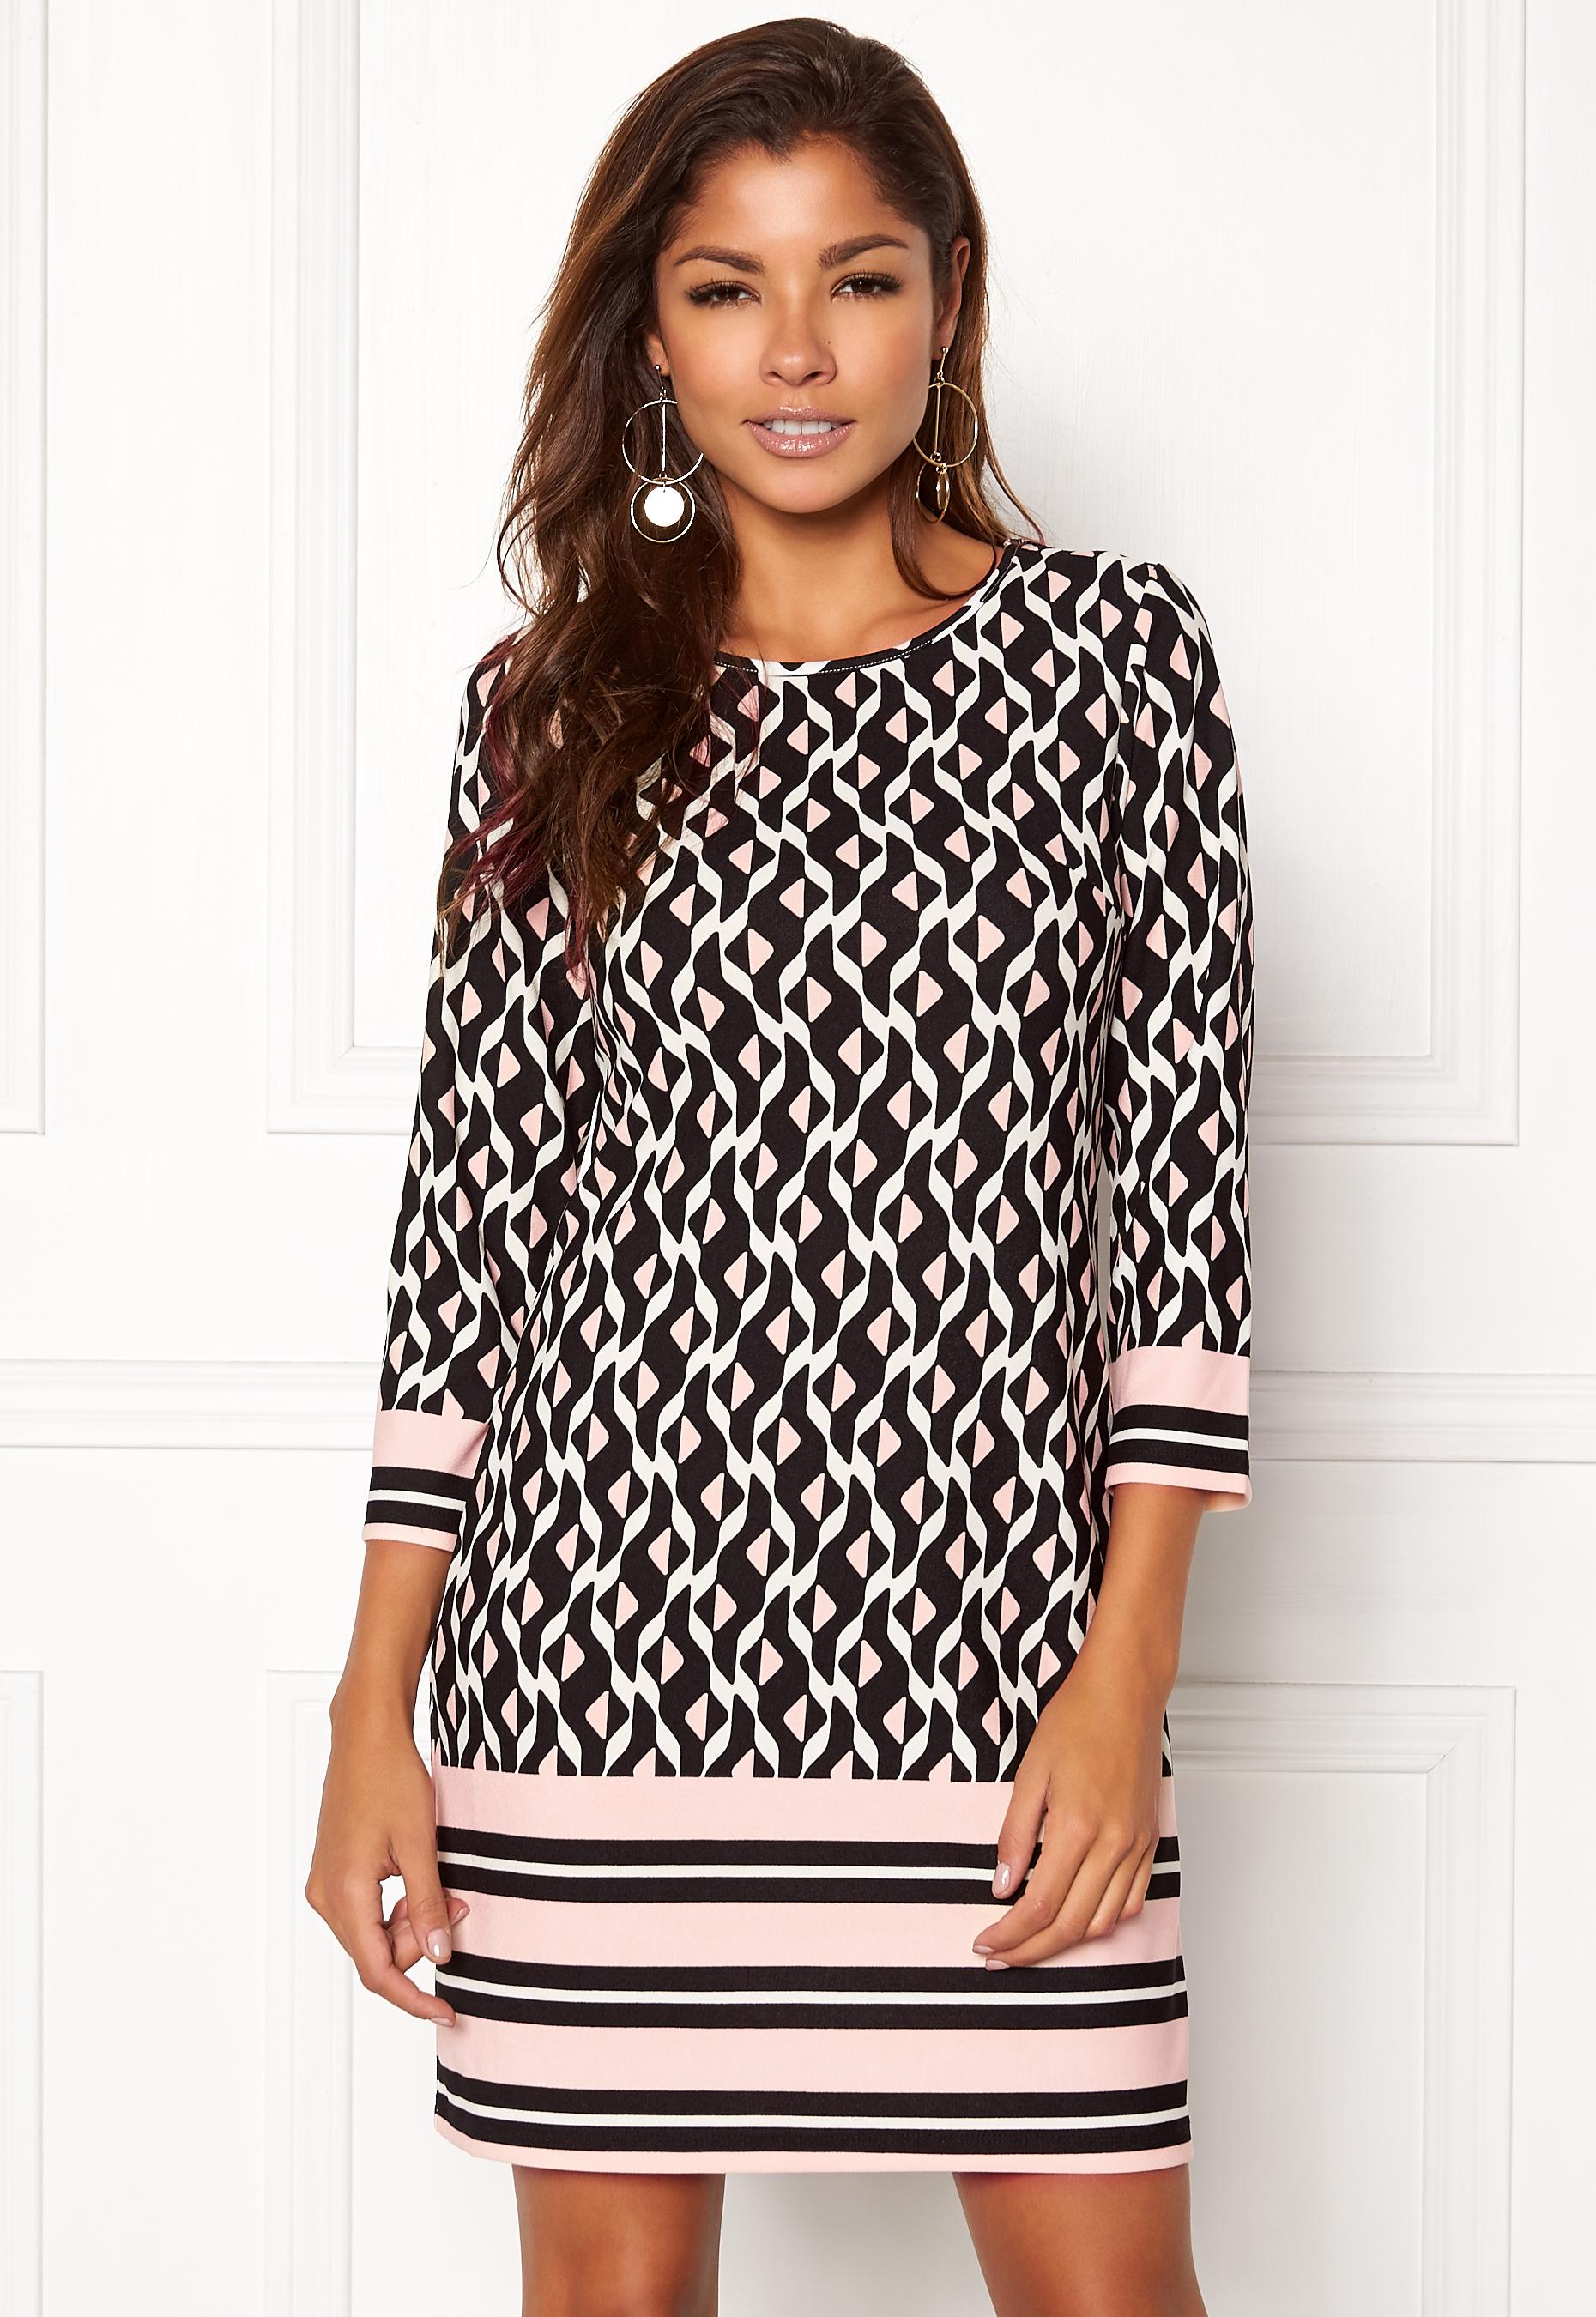 825549c2 Chiara Forthi Maura Dress Black / White / Pink - Bubbleroom